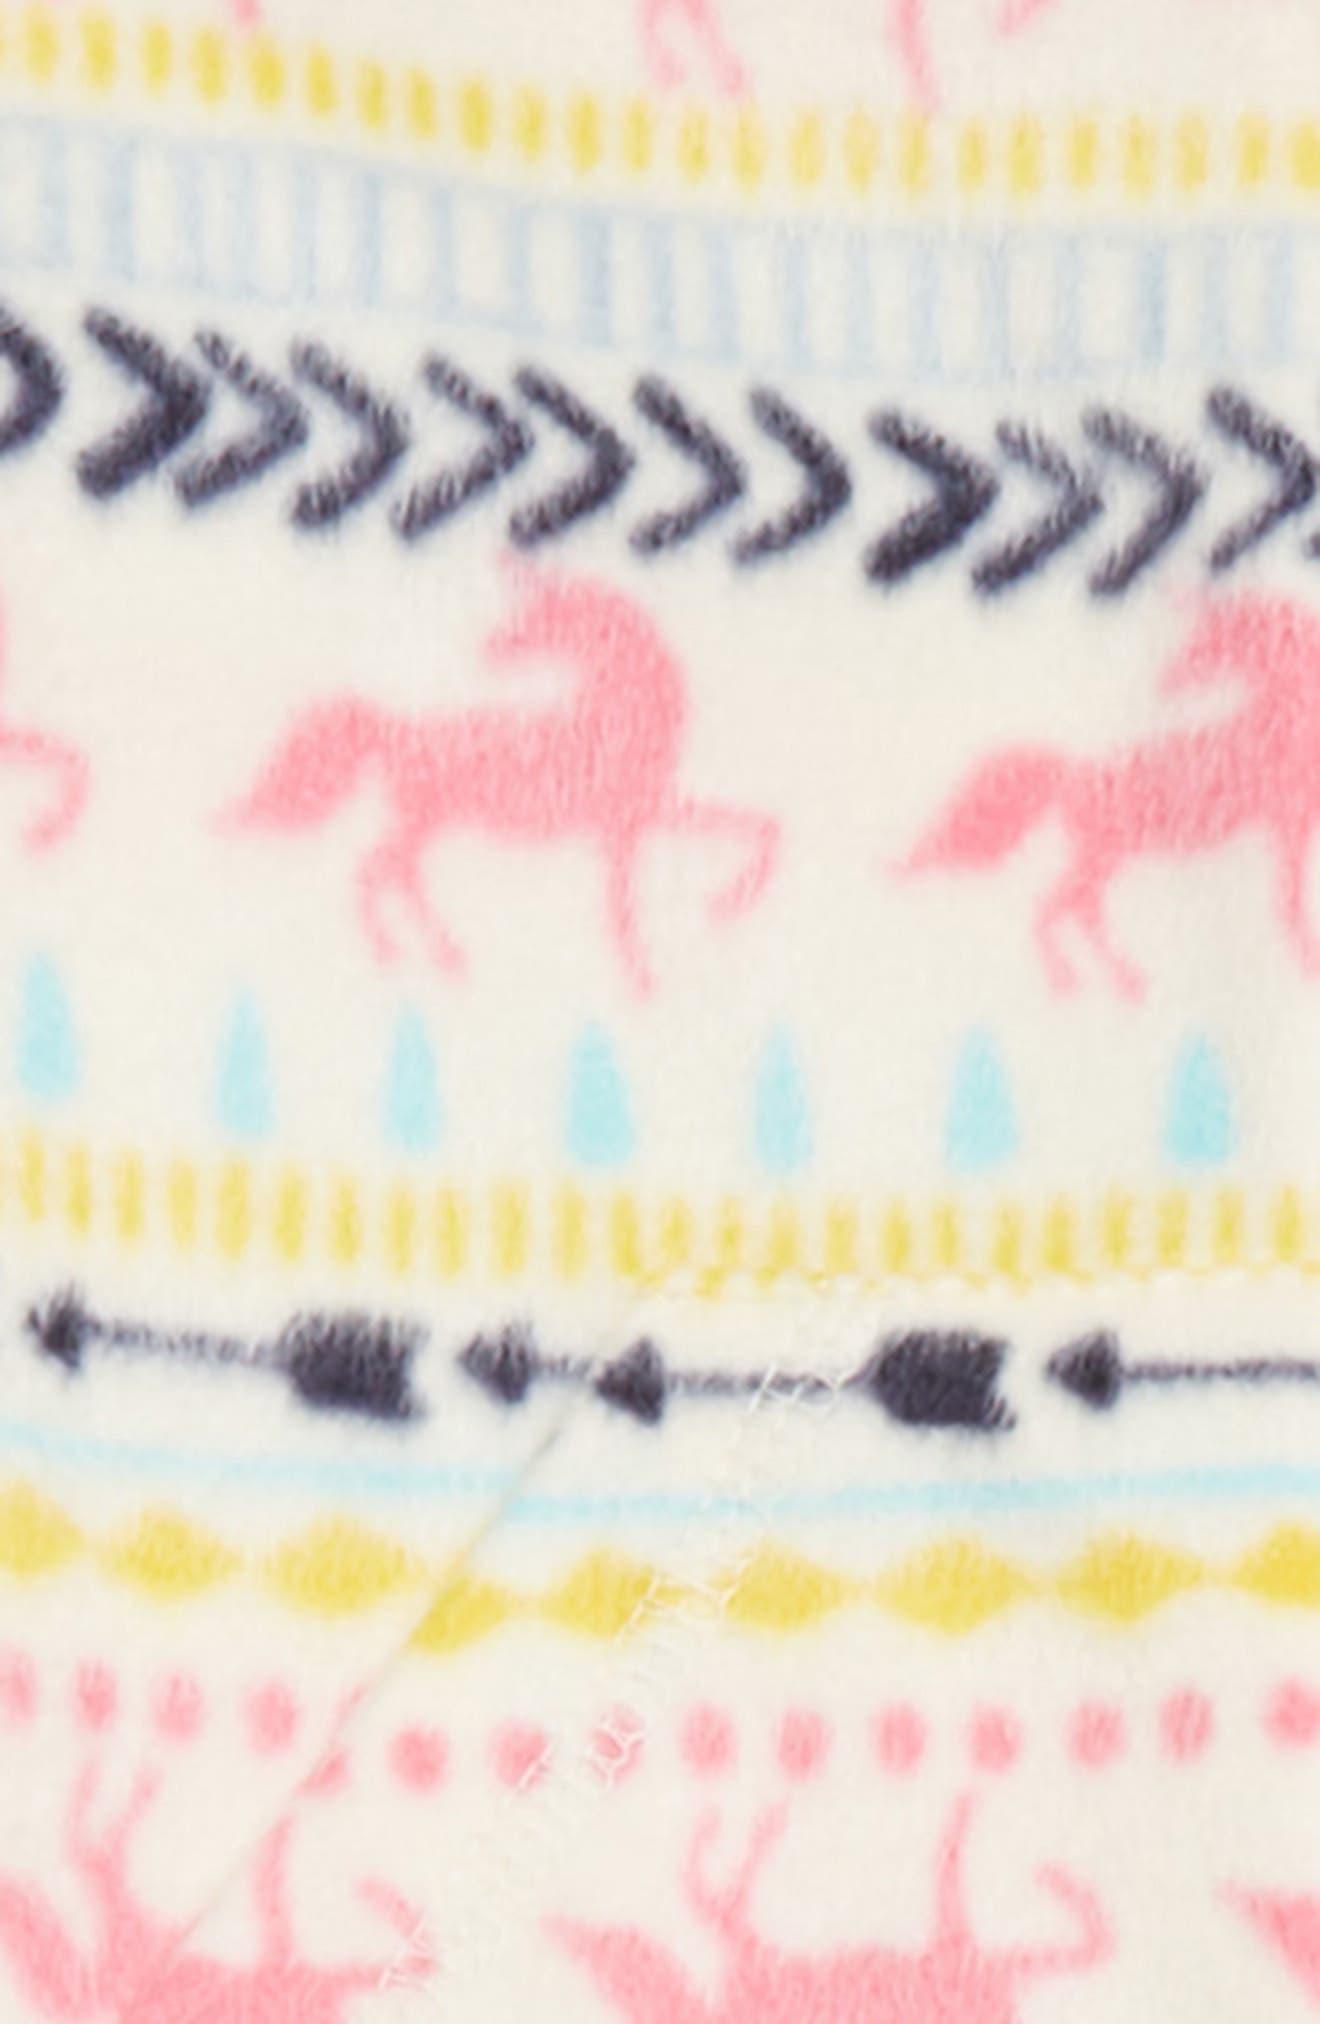 Cozy Print Fitted One-Piece Pajamas,                             Alternate thumbnail 2, color,                             IVORY EGRET UNICORN FAIRISLE